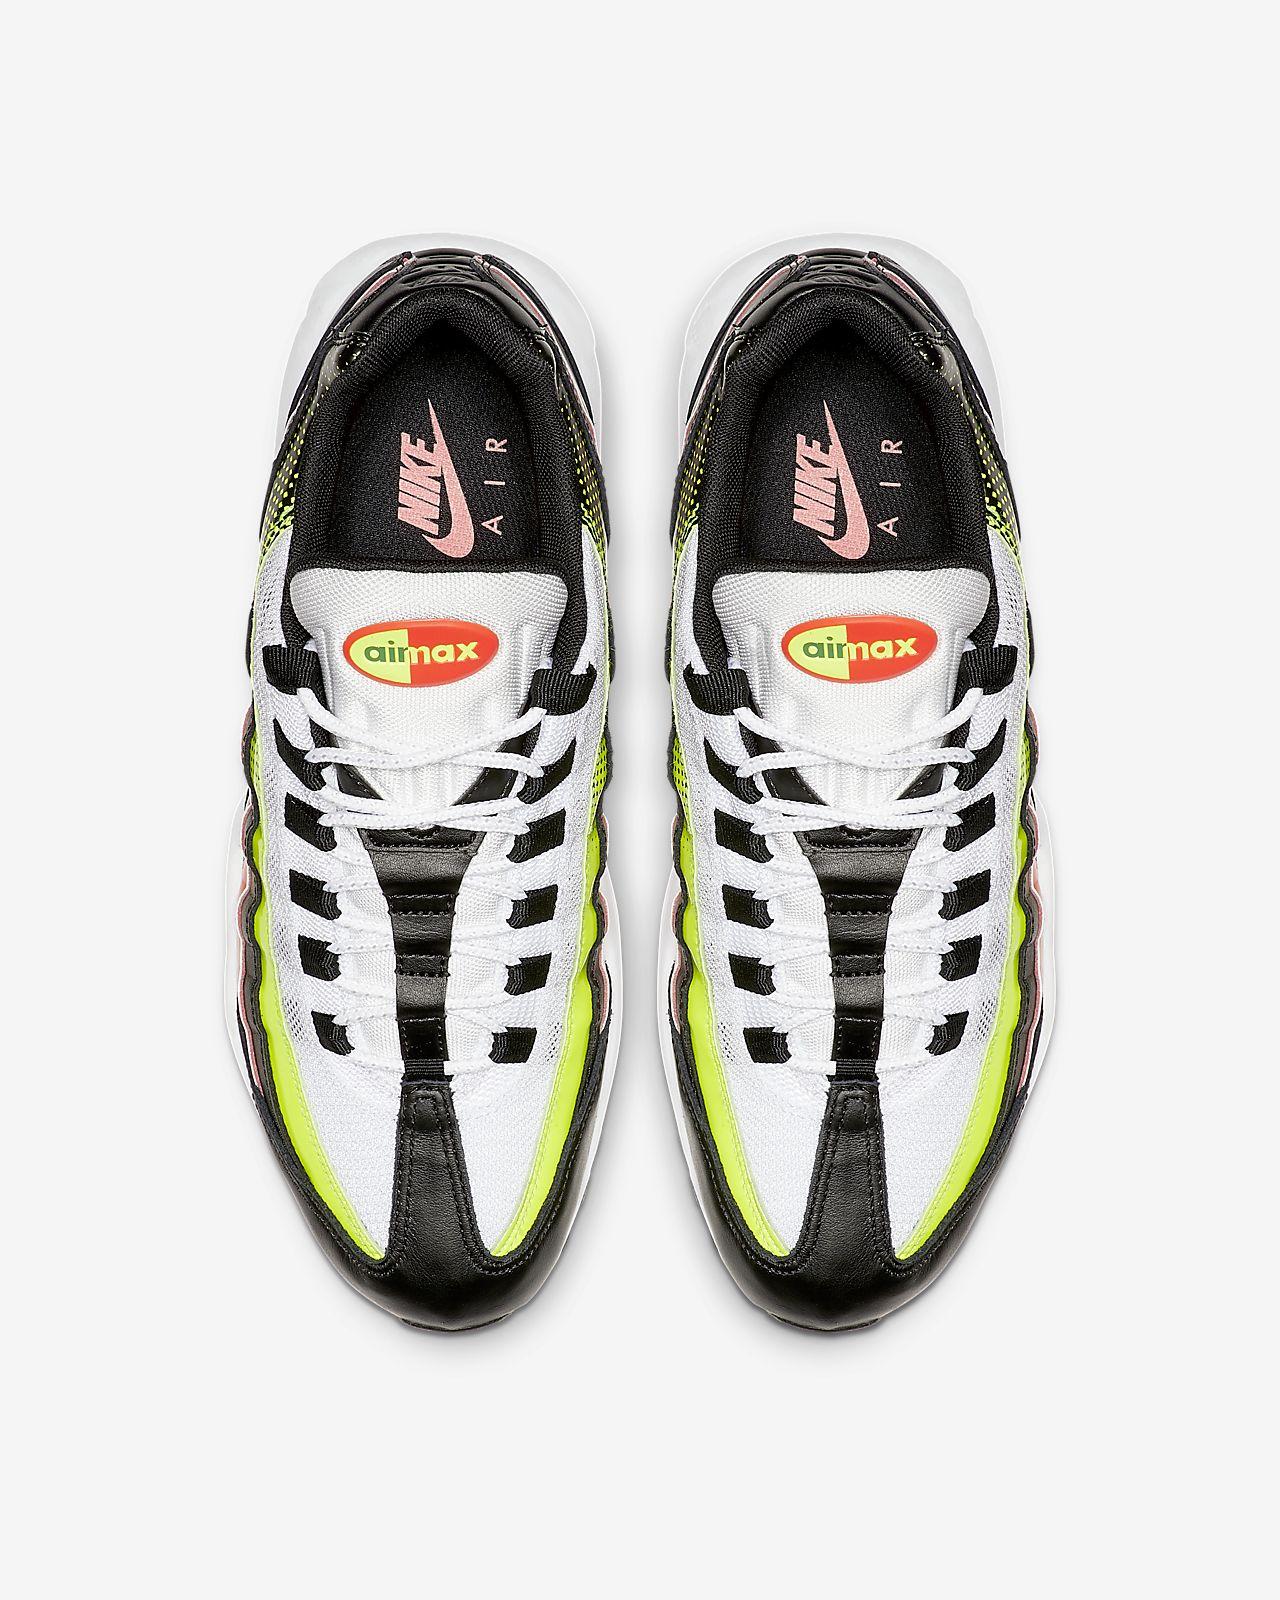 b3d8b8b1c1 Nike Air Max 95 SE Men's Shoe. Nike.com